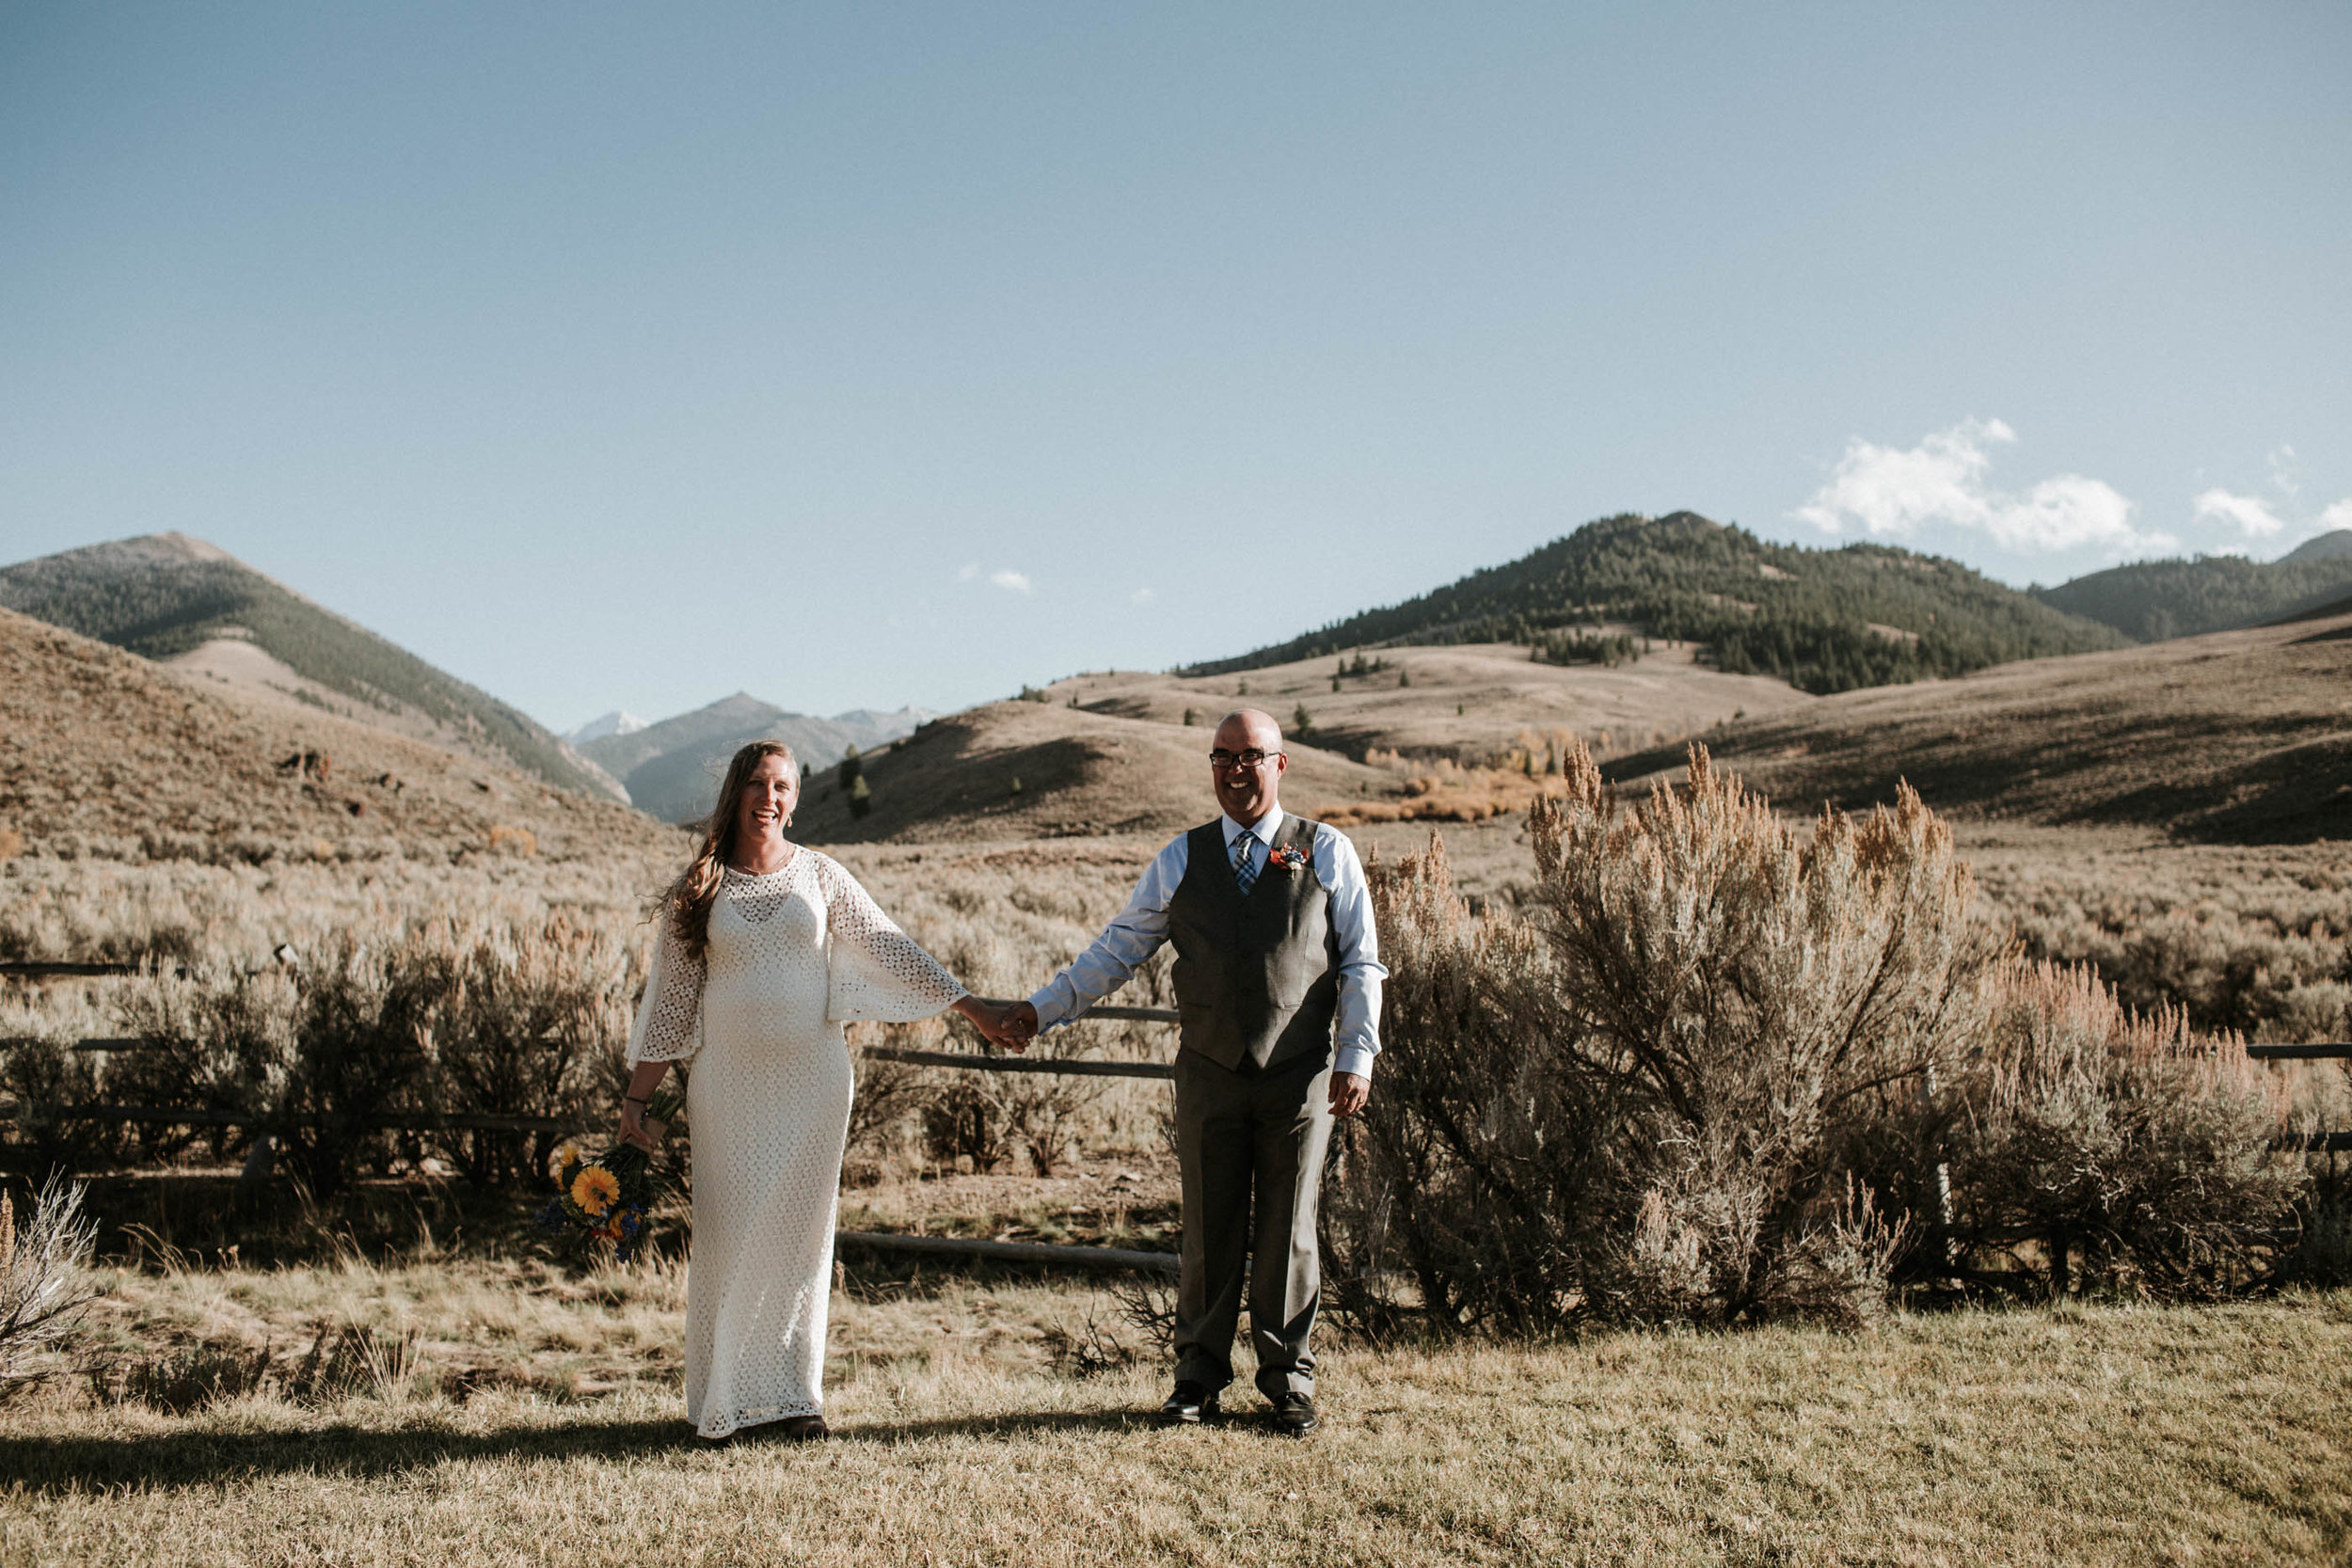 Busterback ranch wedding